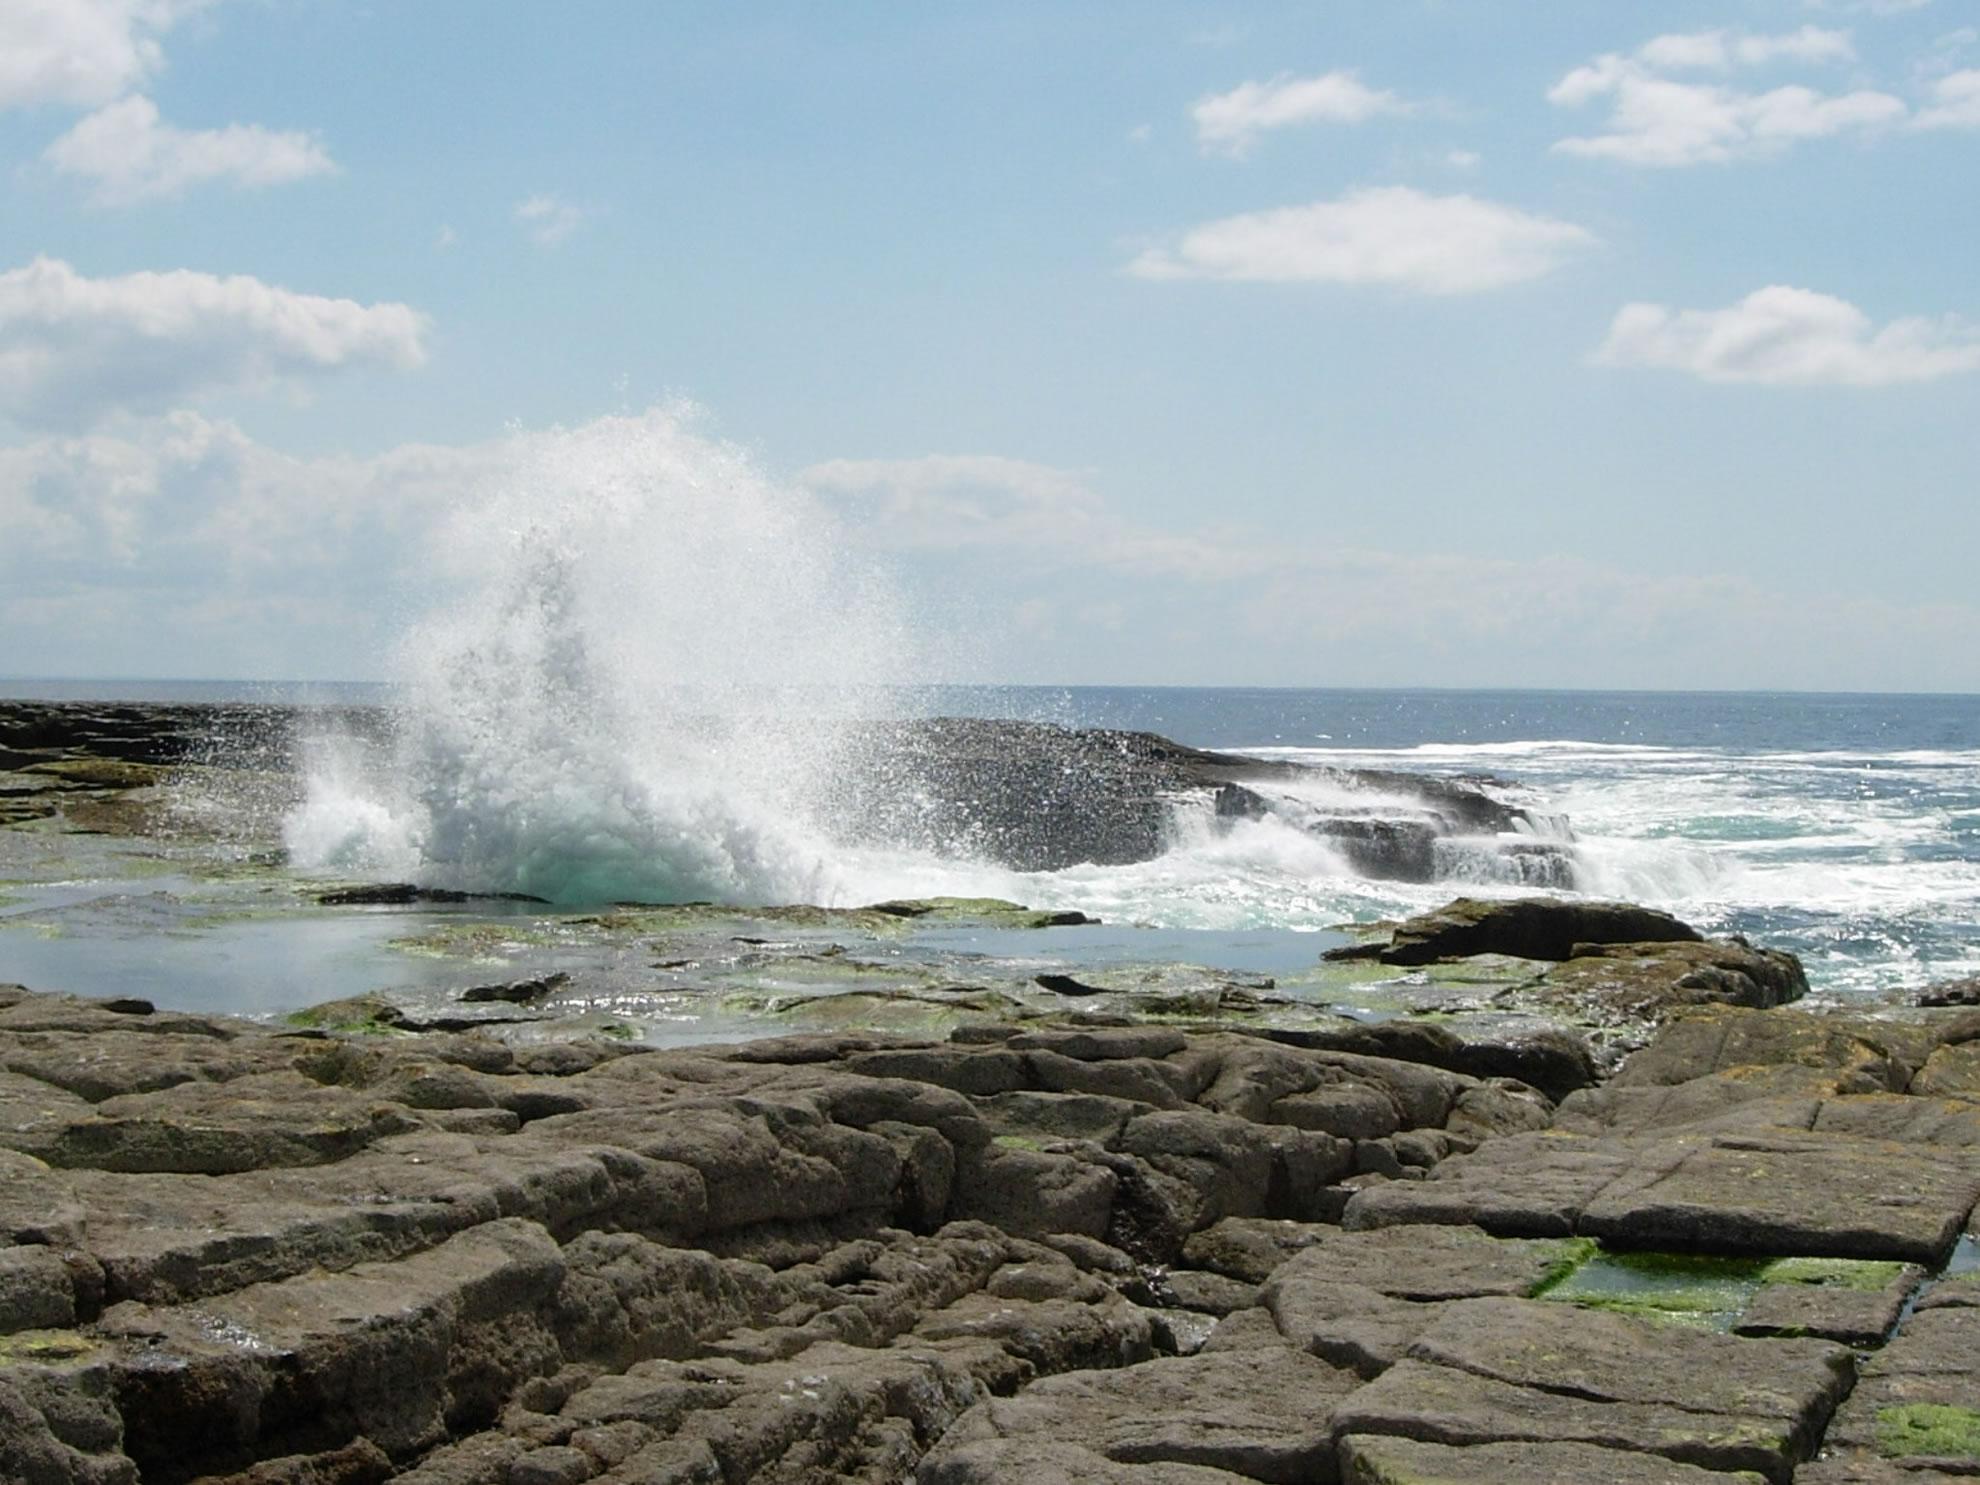 Inis Meain - Sea